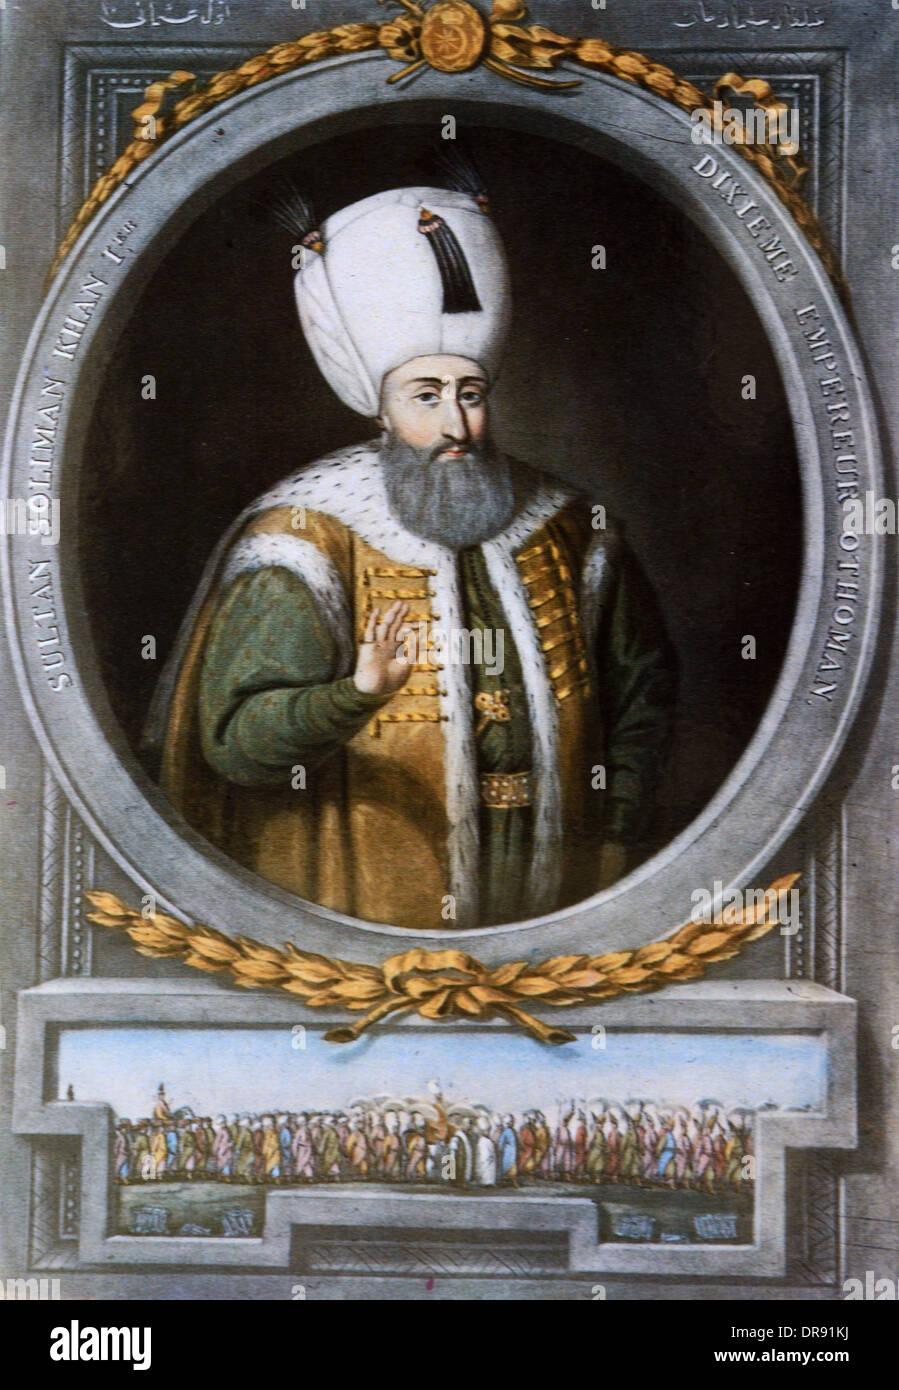 Turkish Ottoman Suleiman I (1494-1566) the Magnificent Portrait - Stock Image